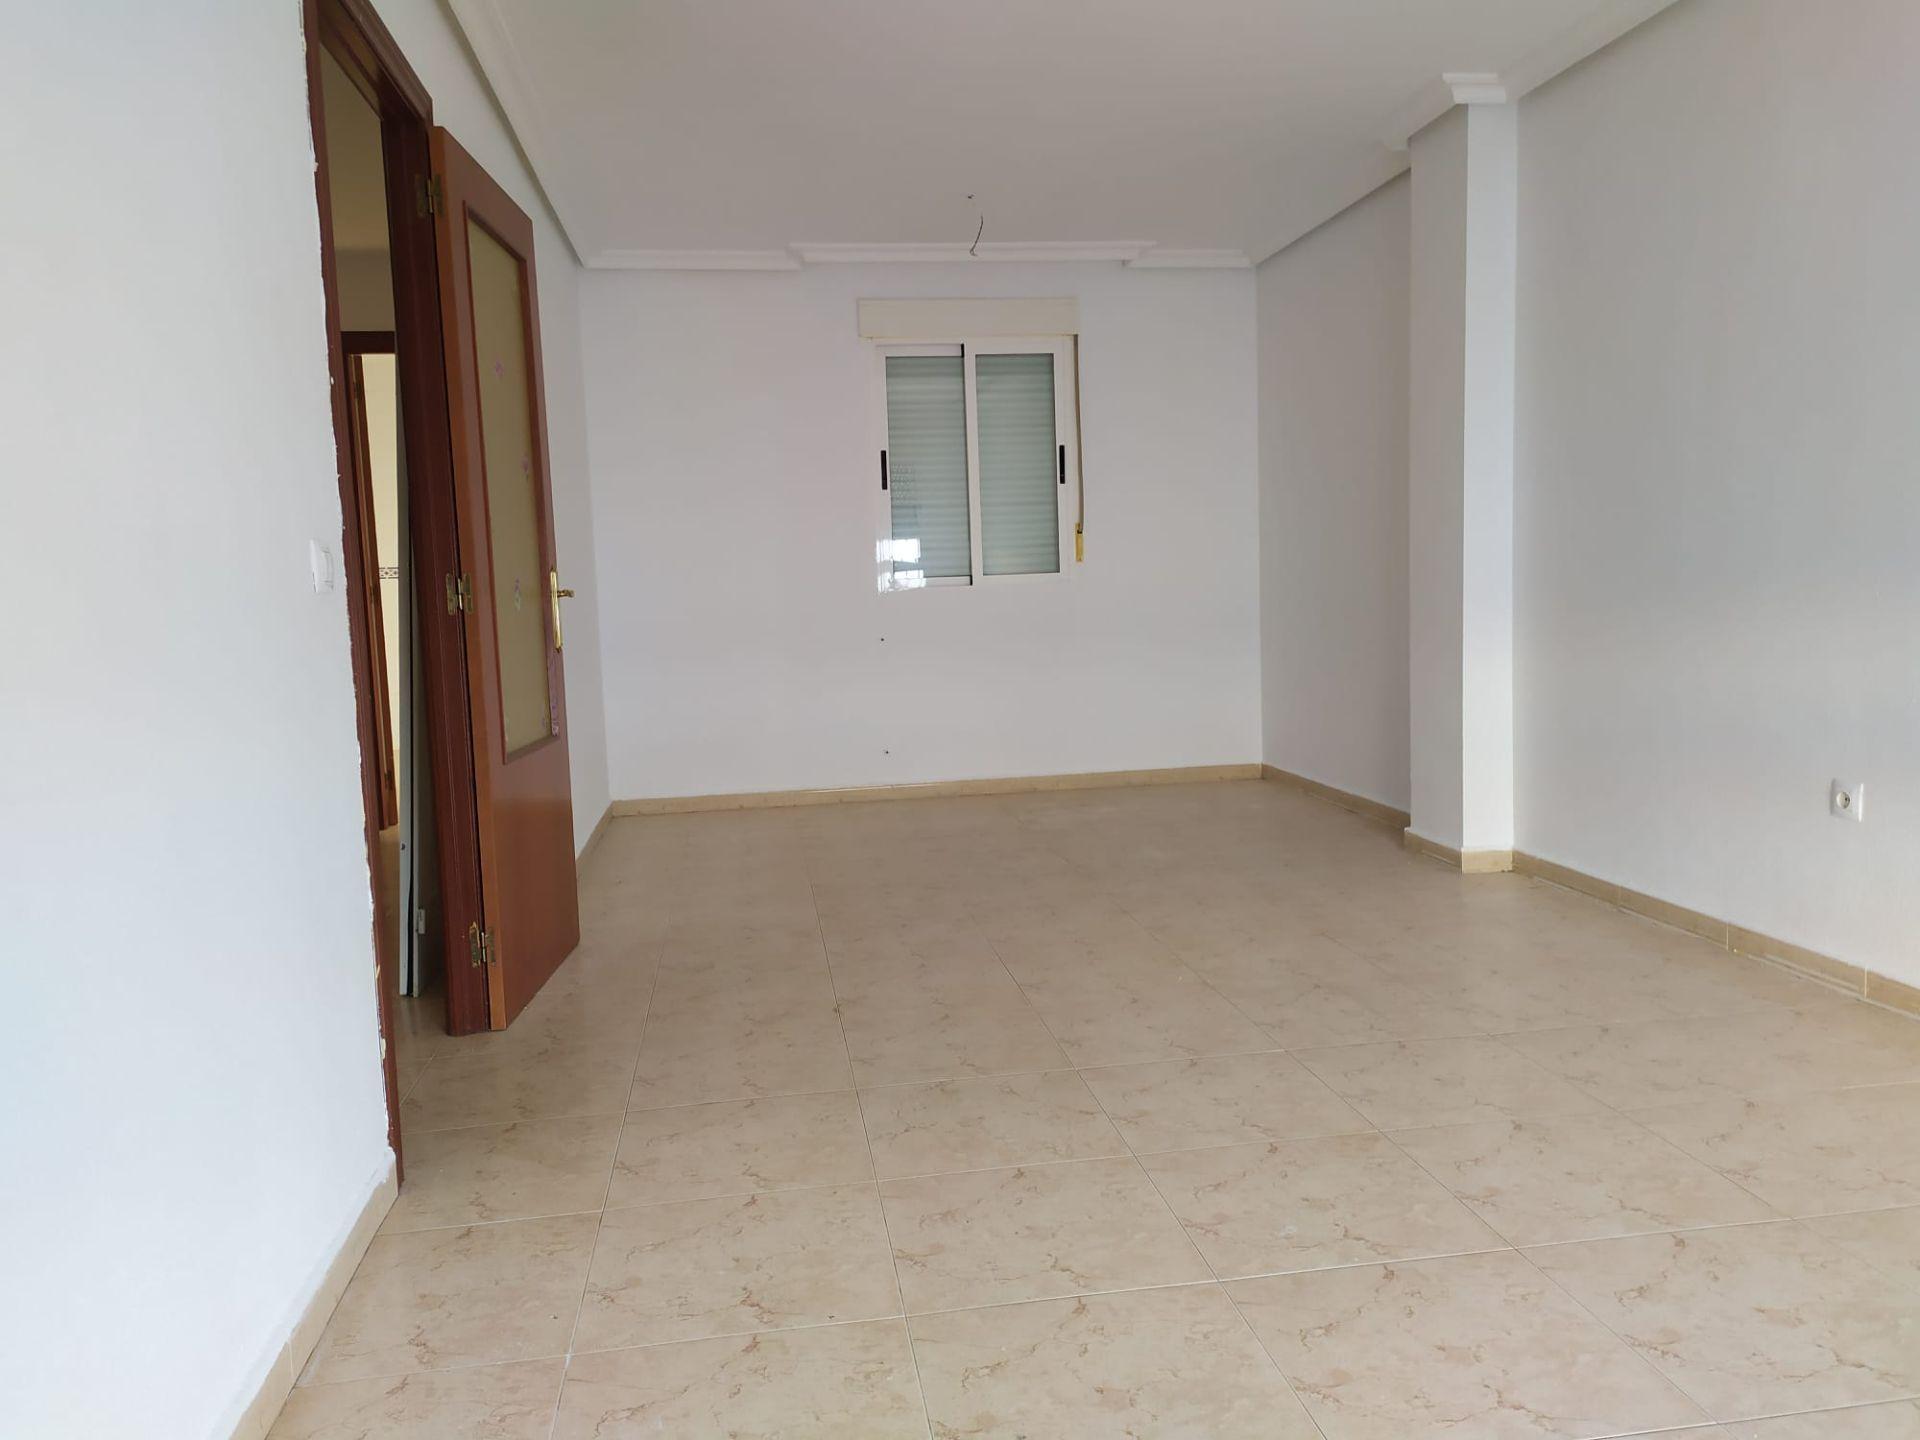 Casa adosada en Cáceres, ALDEA MORET, venta